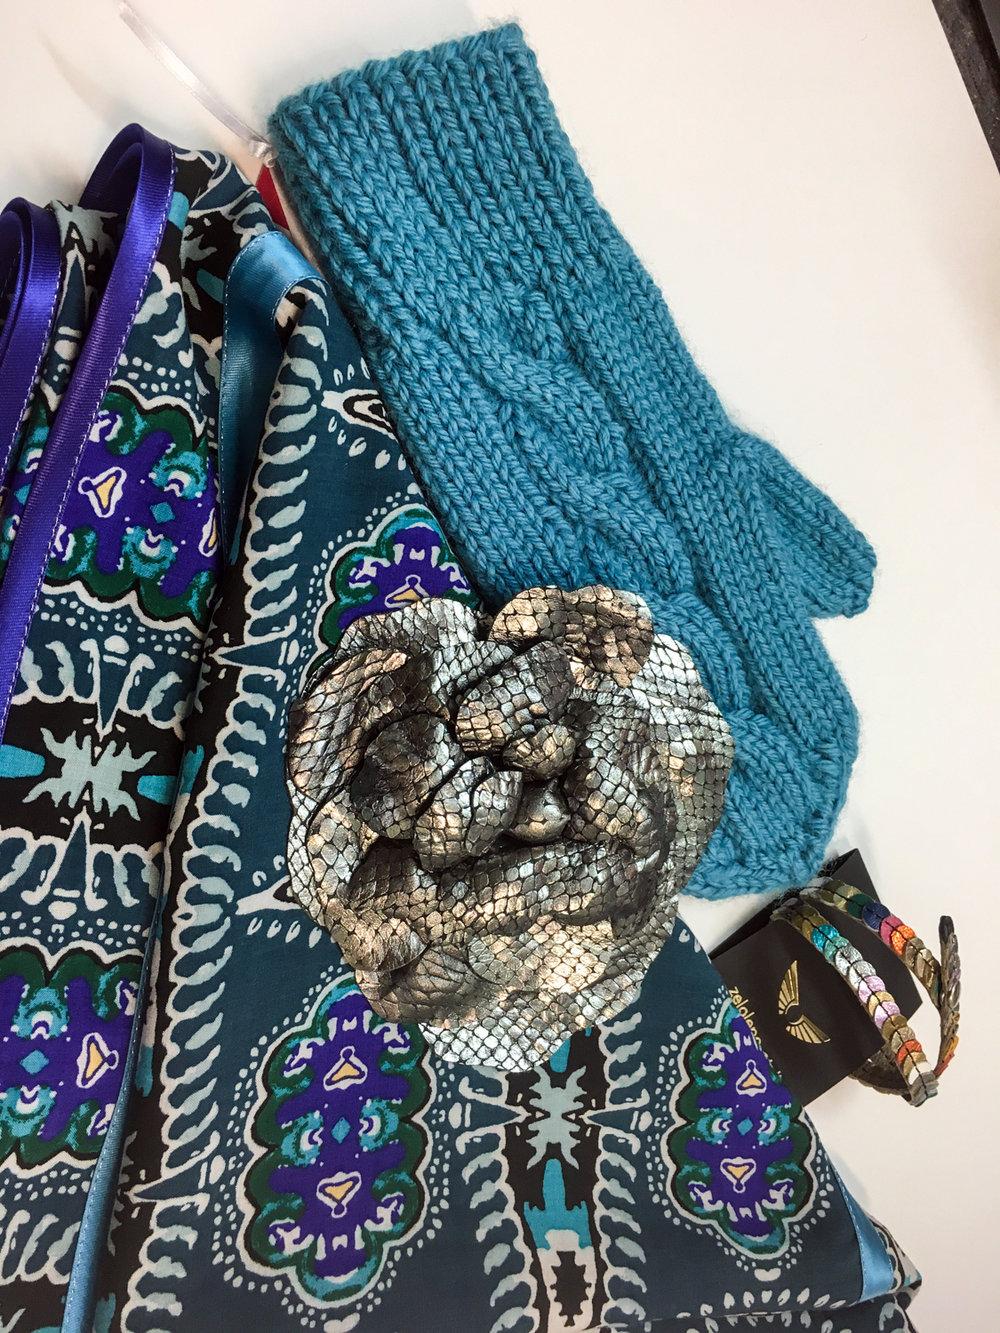 NI ruta, Lazovski roža broška, Zelolepo zapestnica, Lolipop rokavice